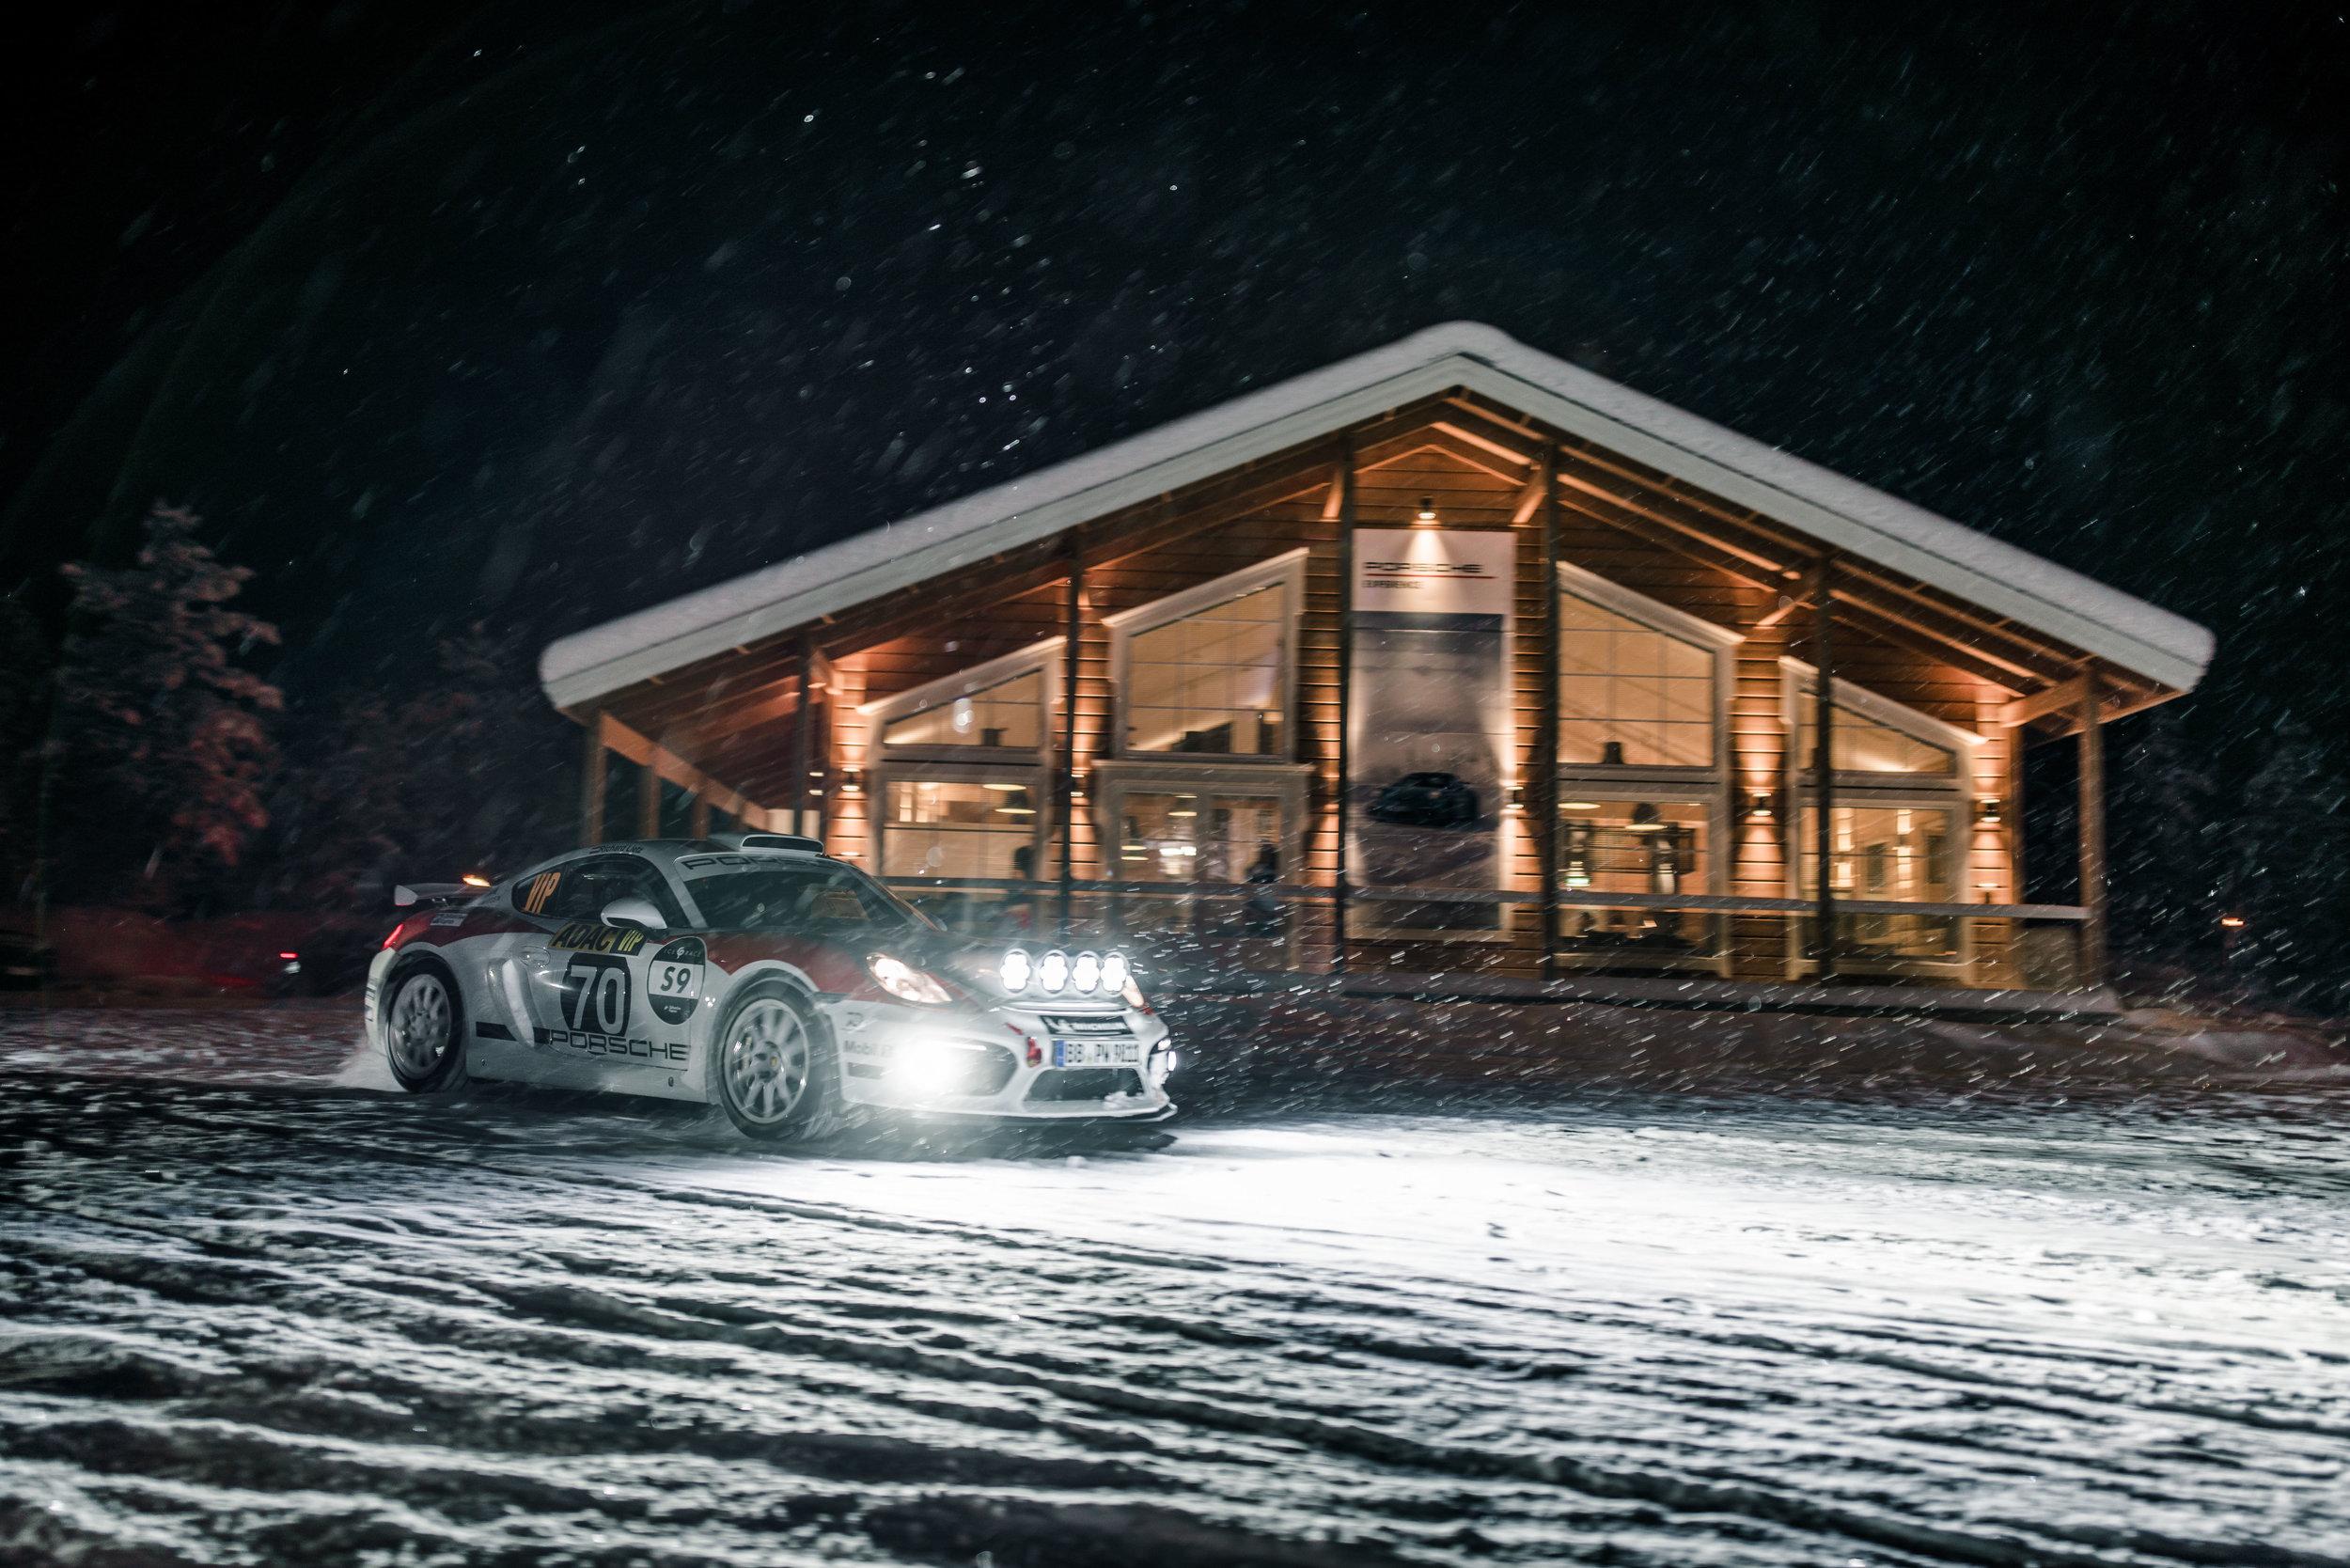 Porsche Ice Experience on Ice_30_01_2019_0799_175731.jpg